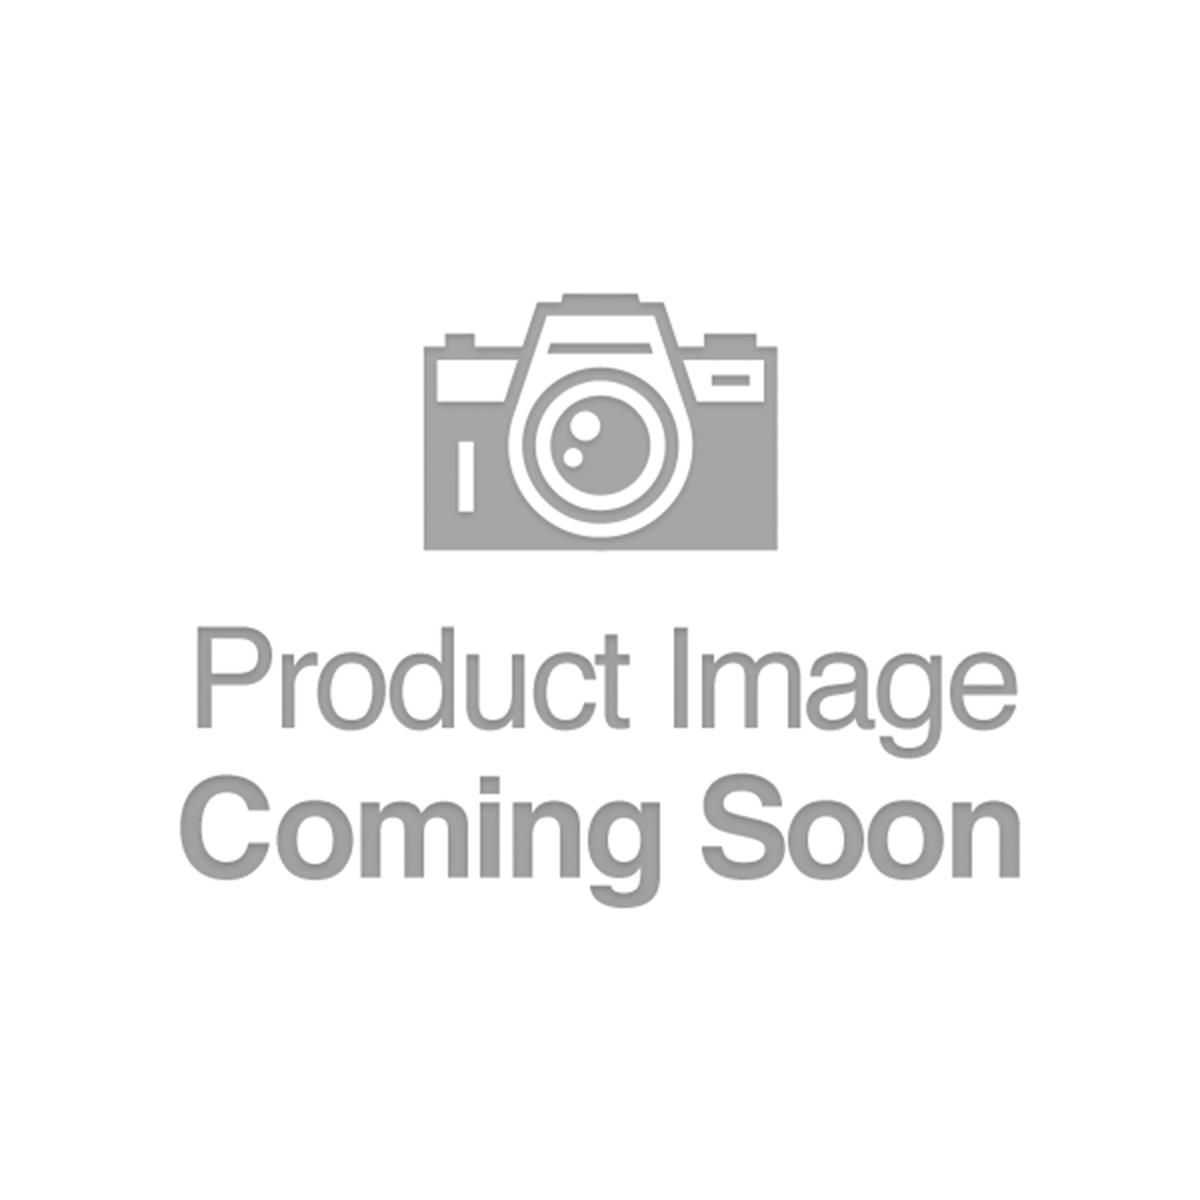 FR 224 $1 1896 Silver Certificate PCGS 67 PPQ